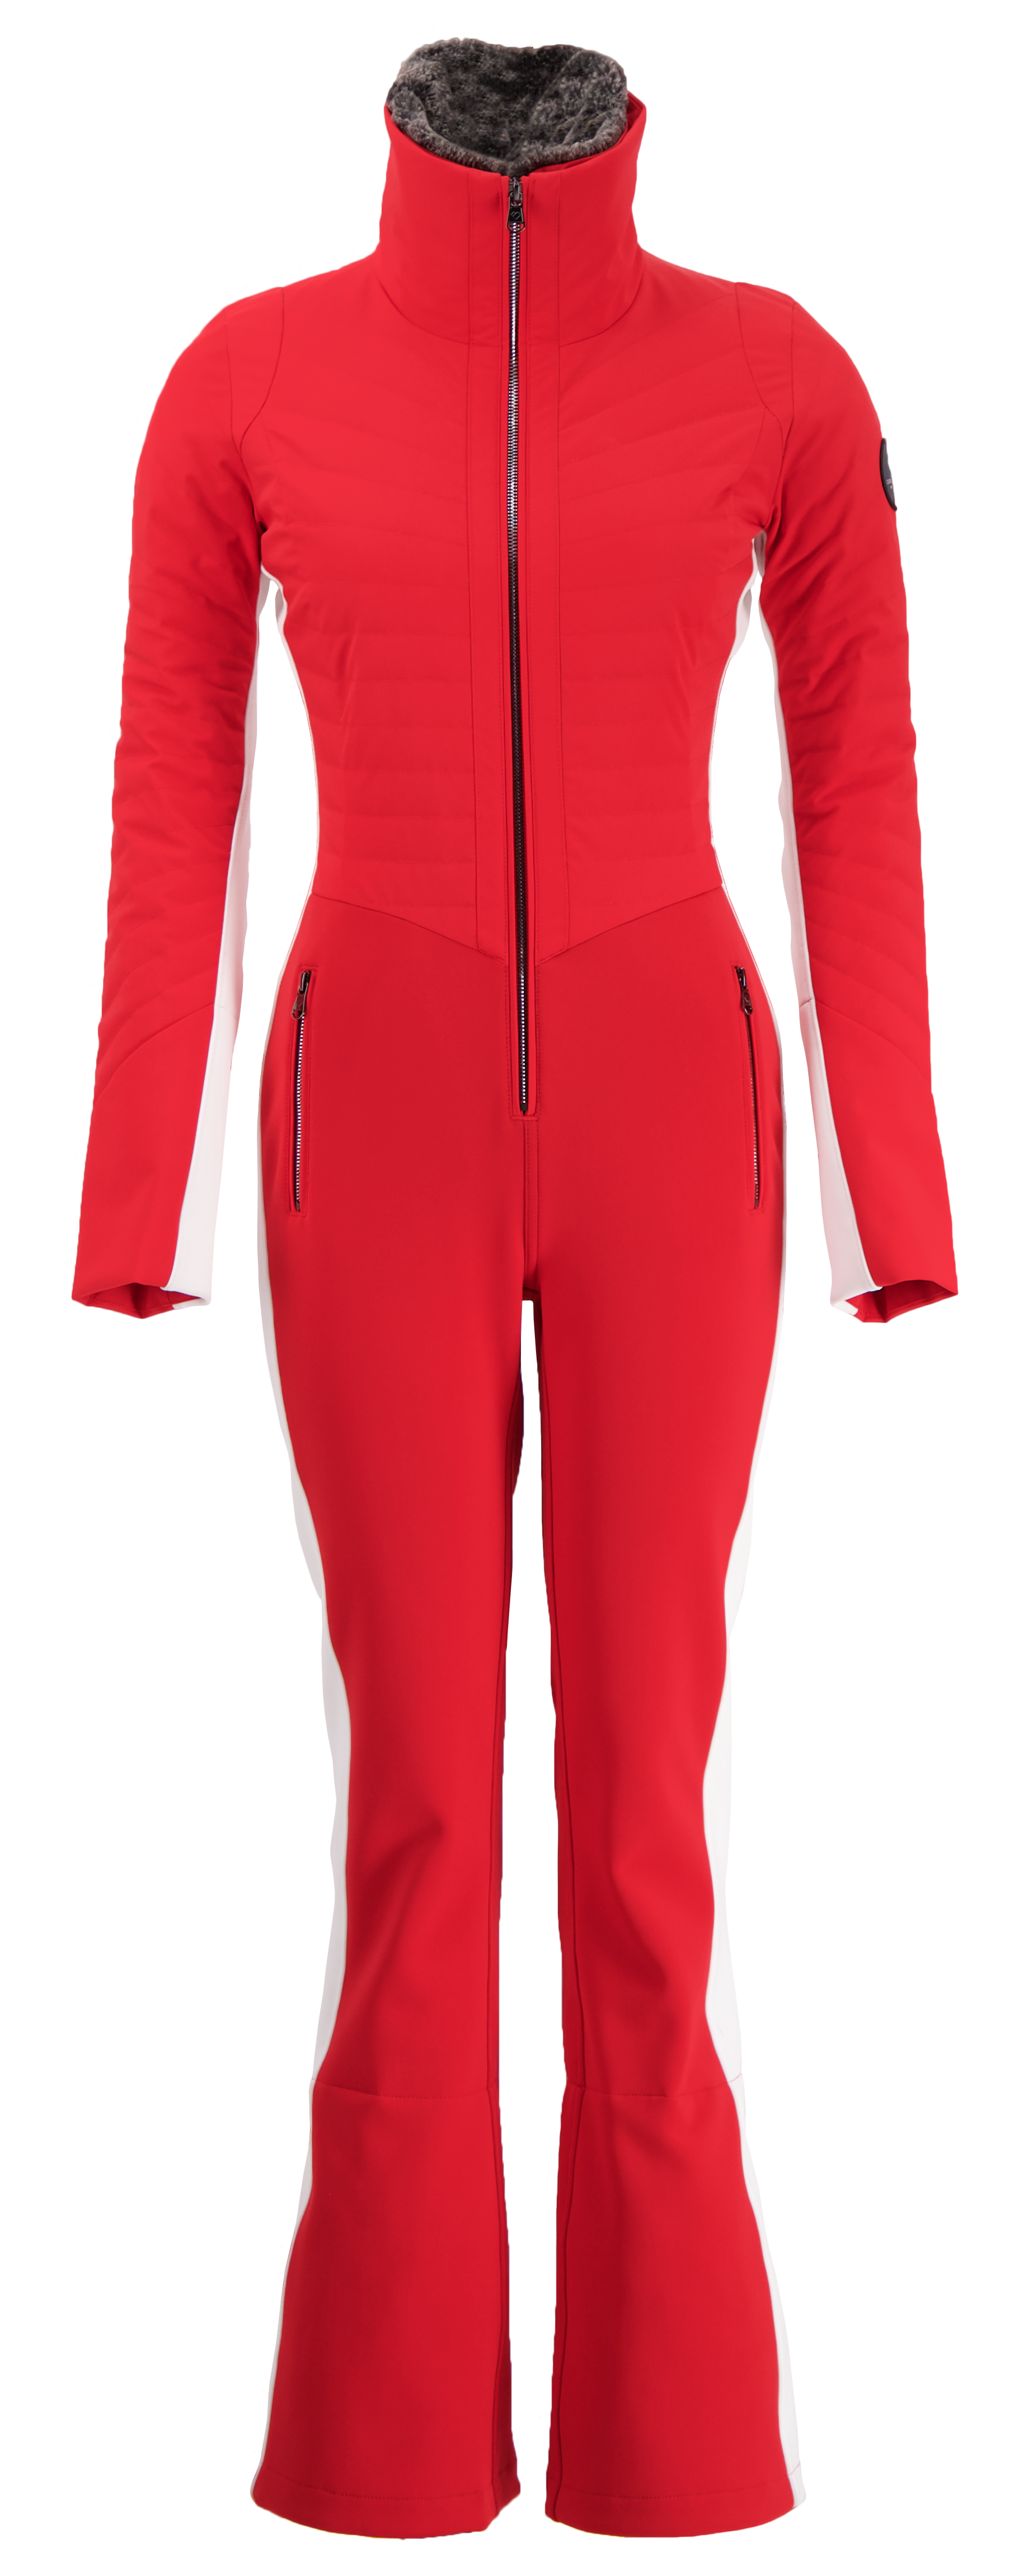 Obermeyer Core Jacket